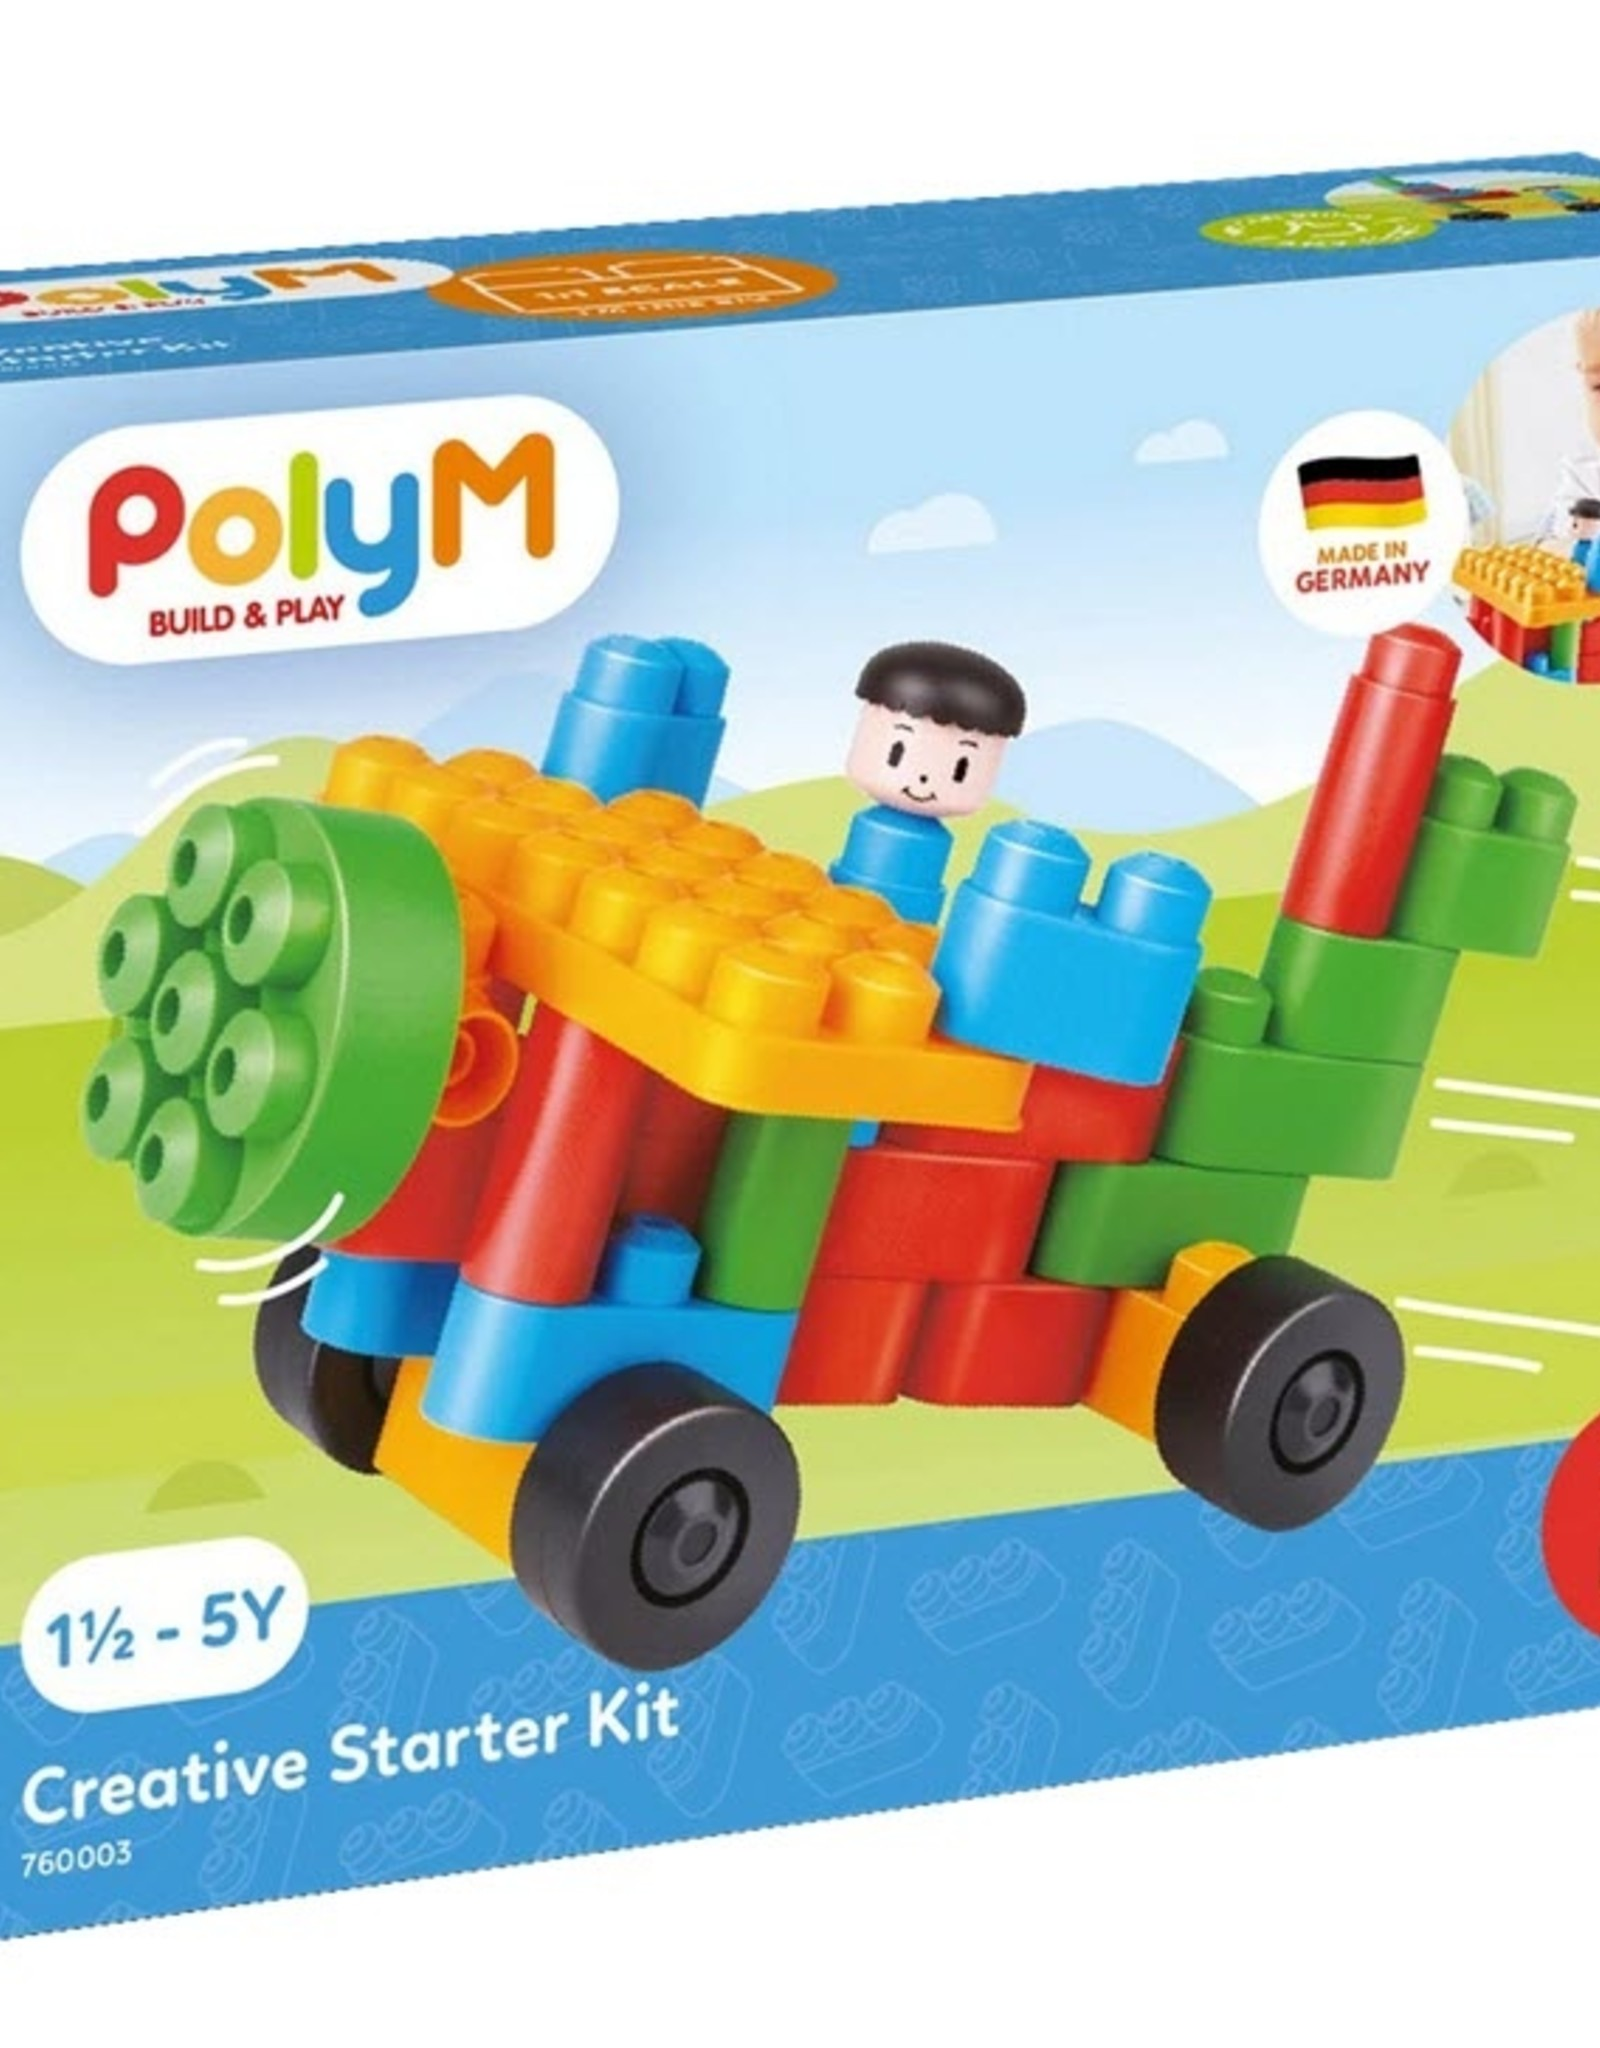 PolyM PolyM - Creative Starter Kit